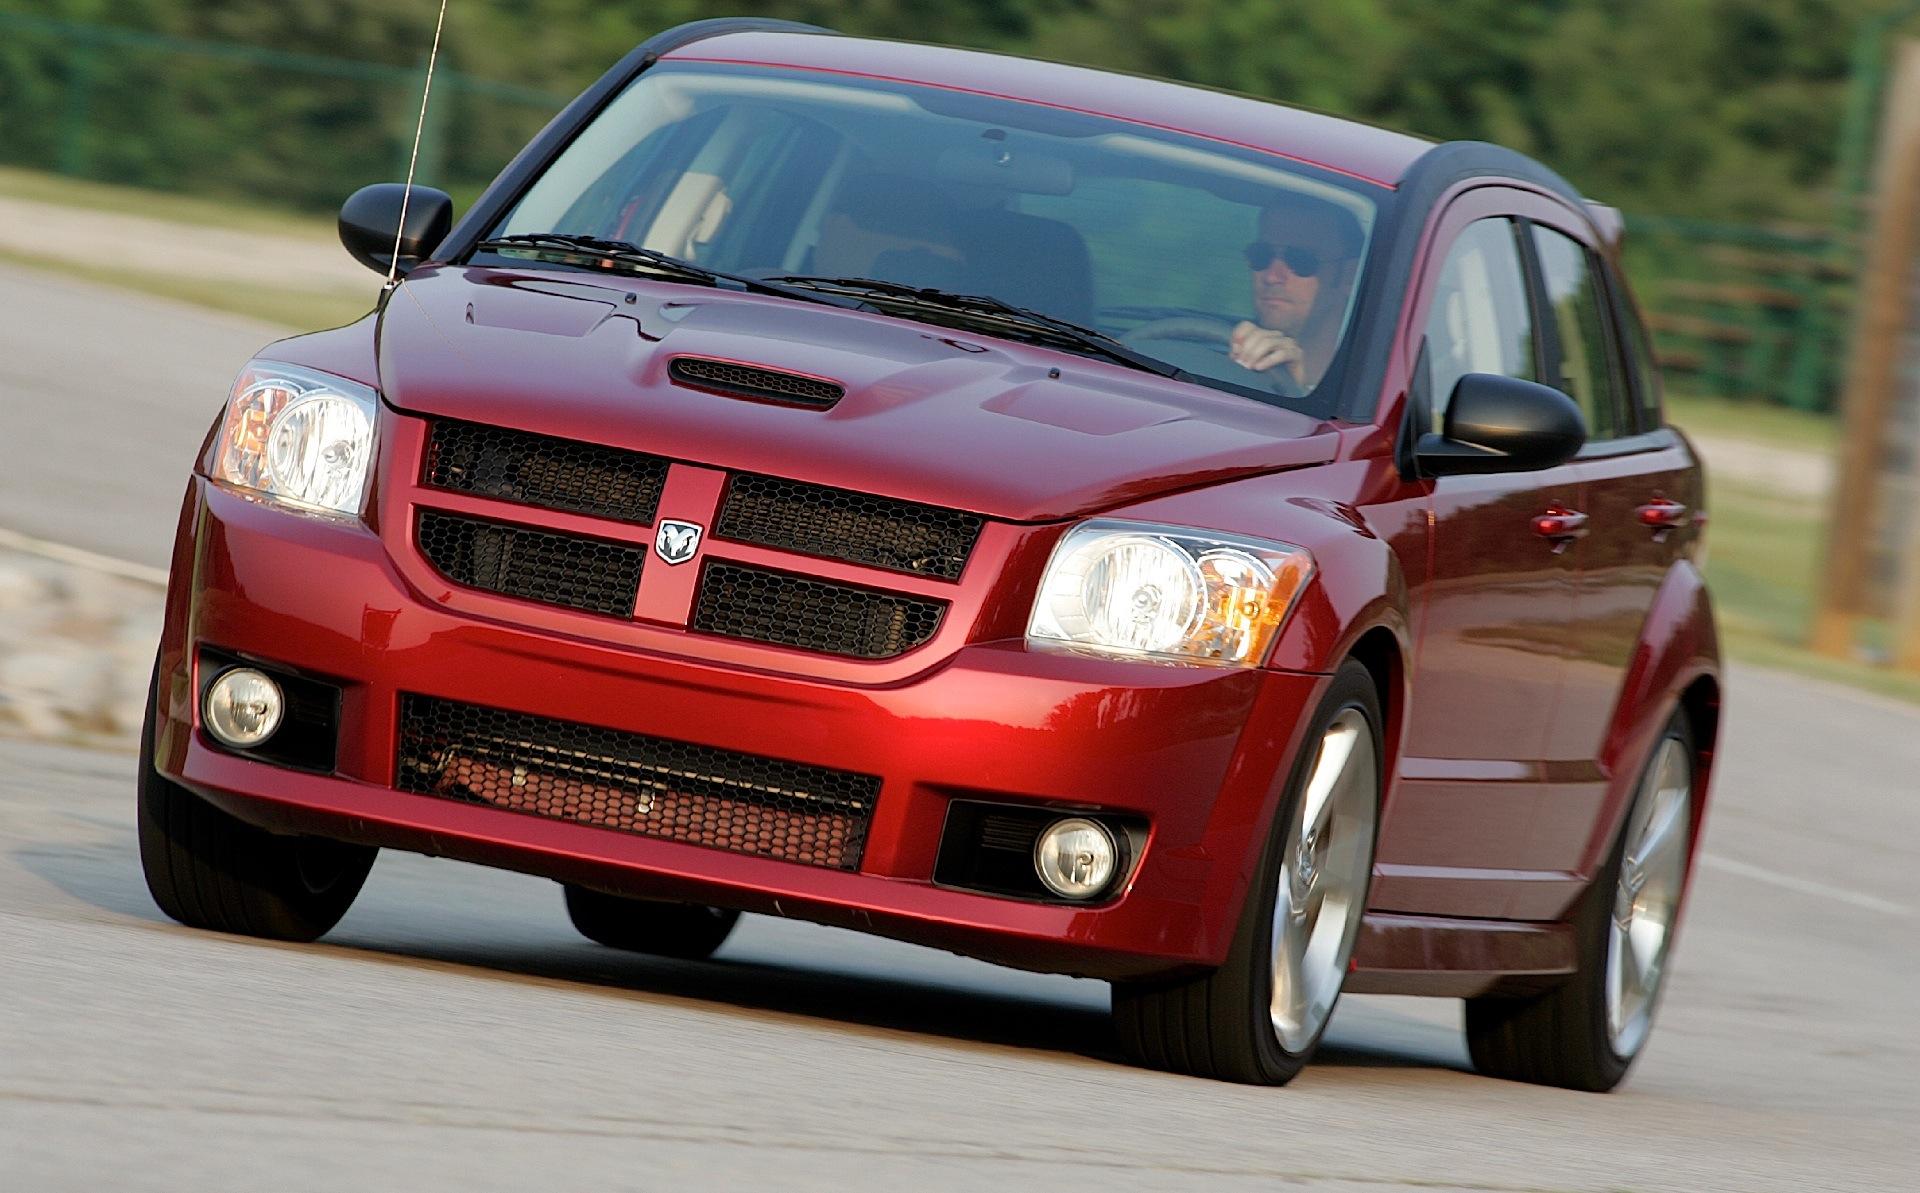 Dodge Caliber Srt4 Specs Photos 2007 2008 2009 2010 2011 Wiring Schematic Starting